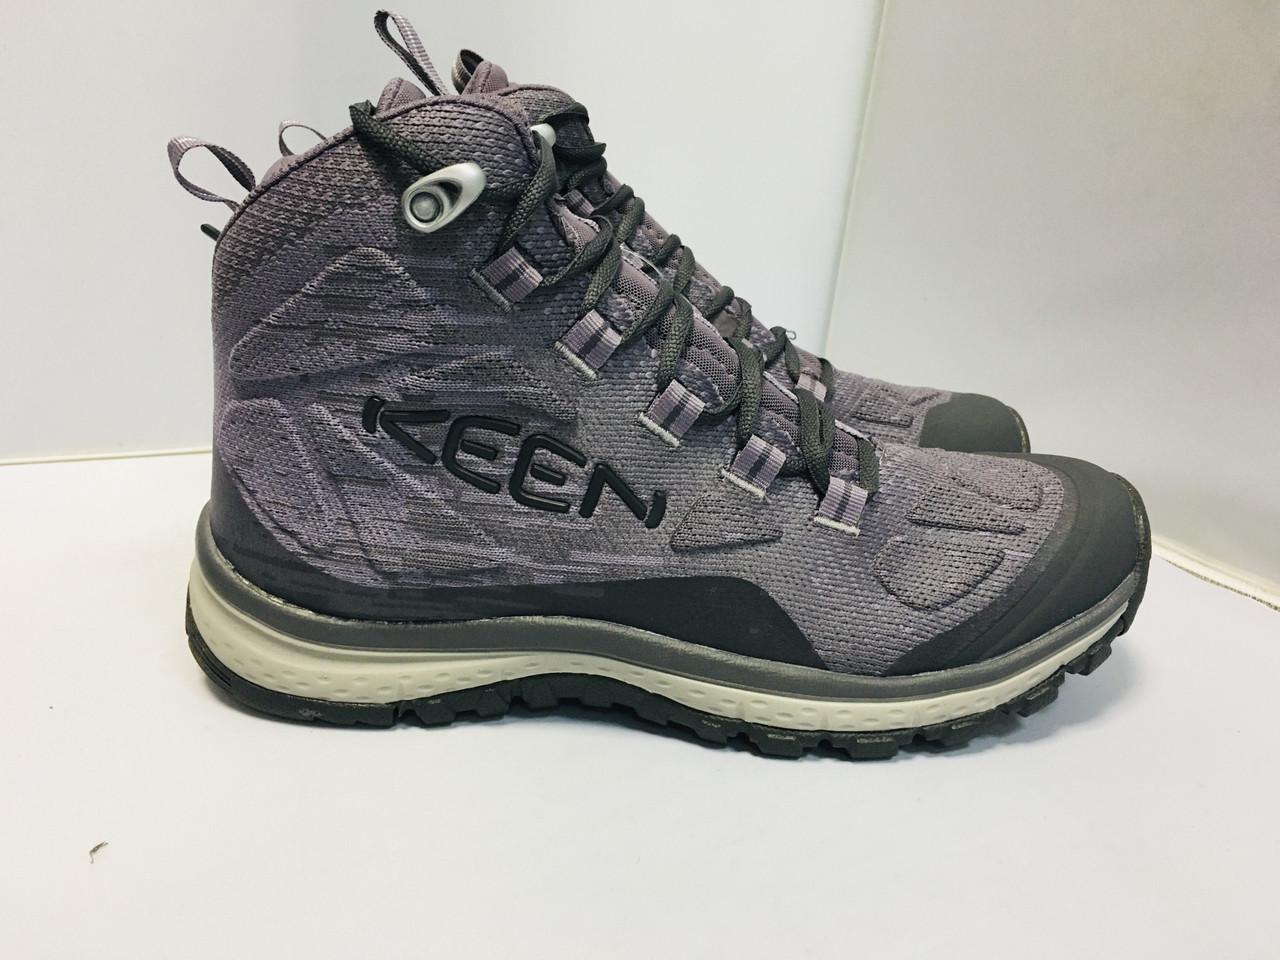 Ботинки Keen, 37,5 размер